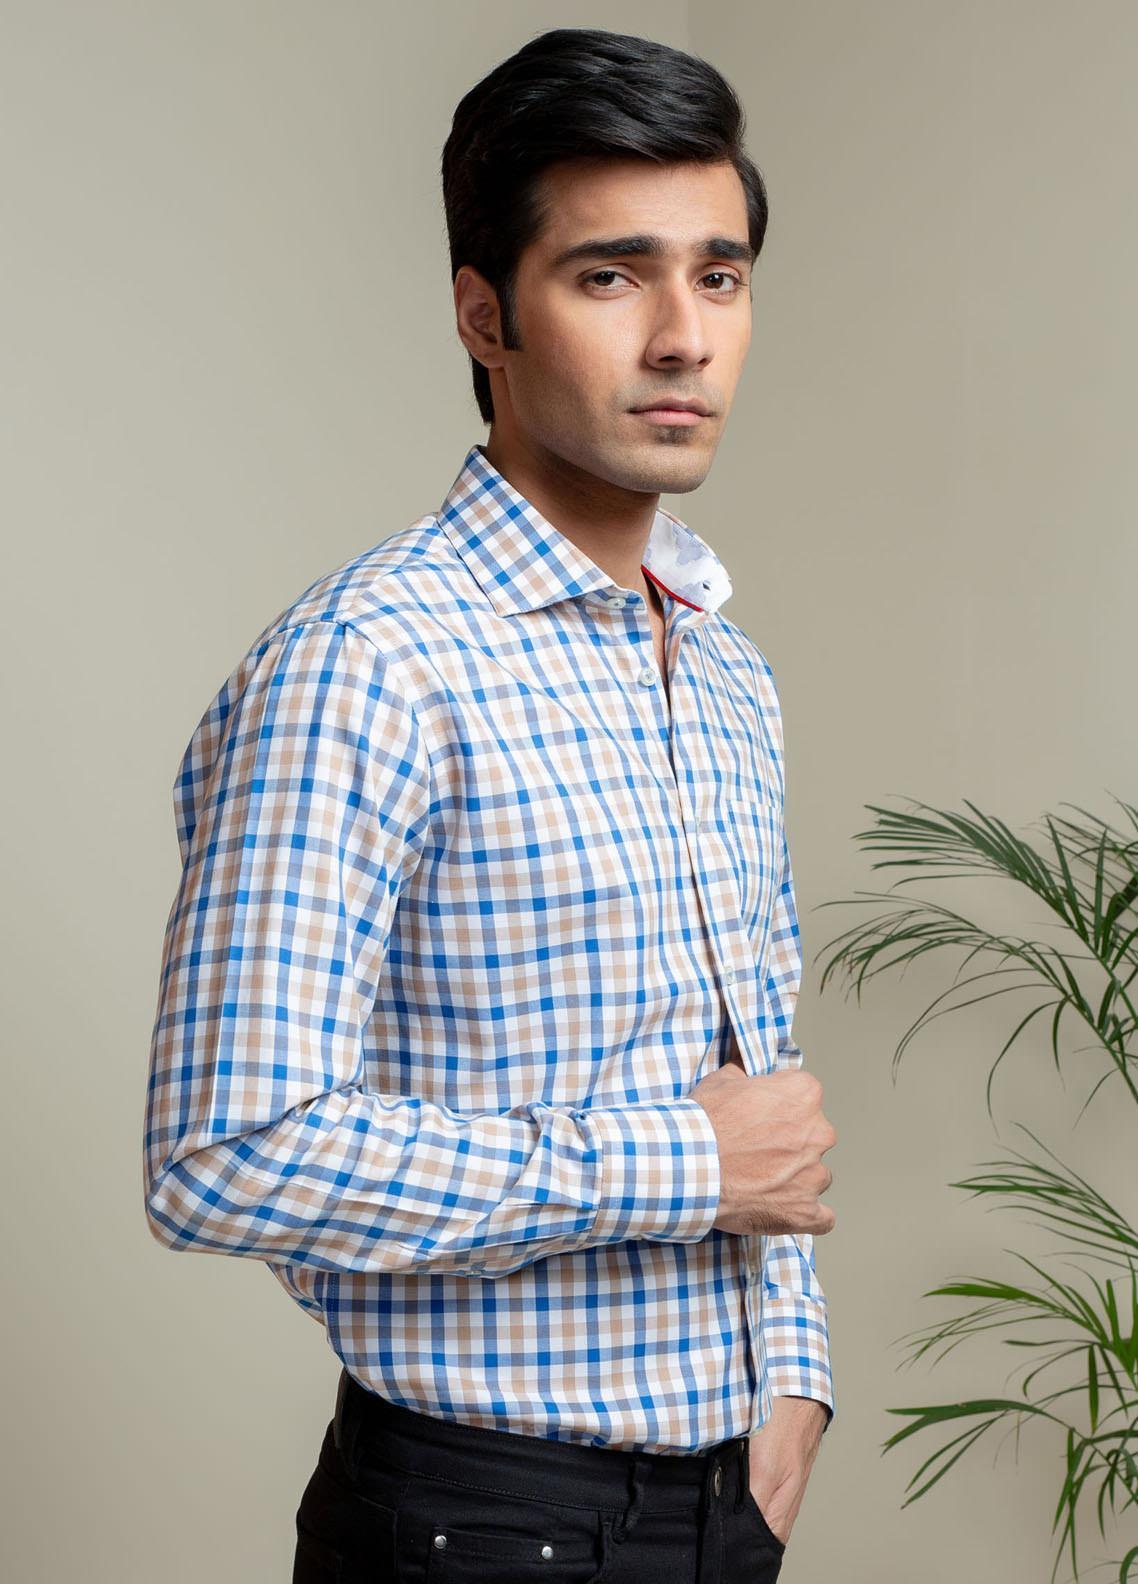 Brumano Cotton Casual Shirts for Men - BM21SH Brown & Blue Gingham Check